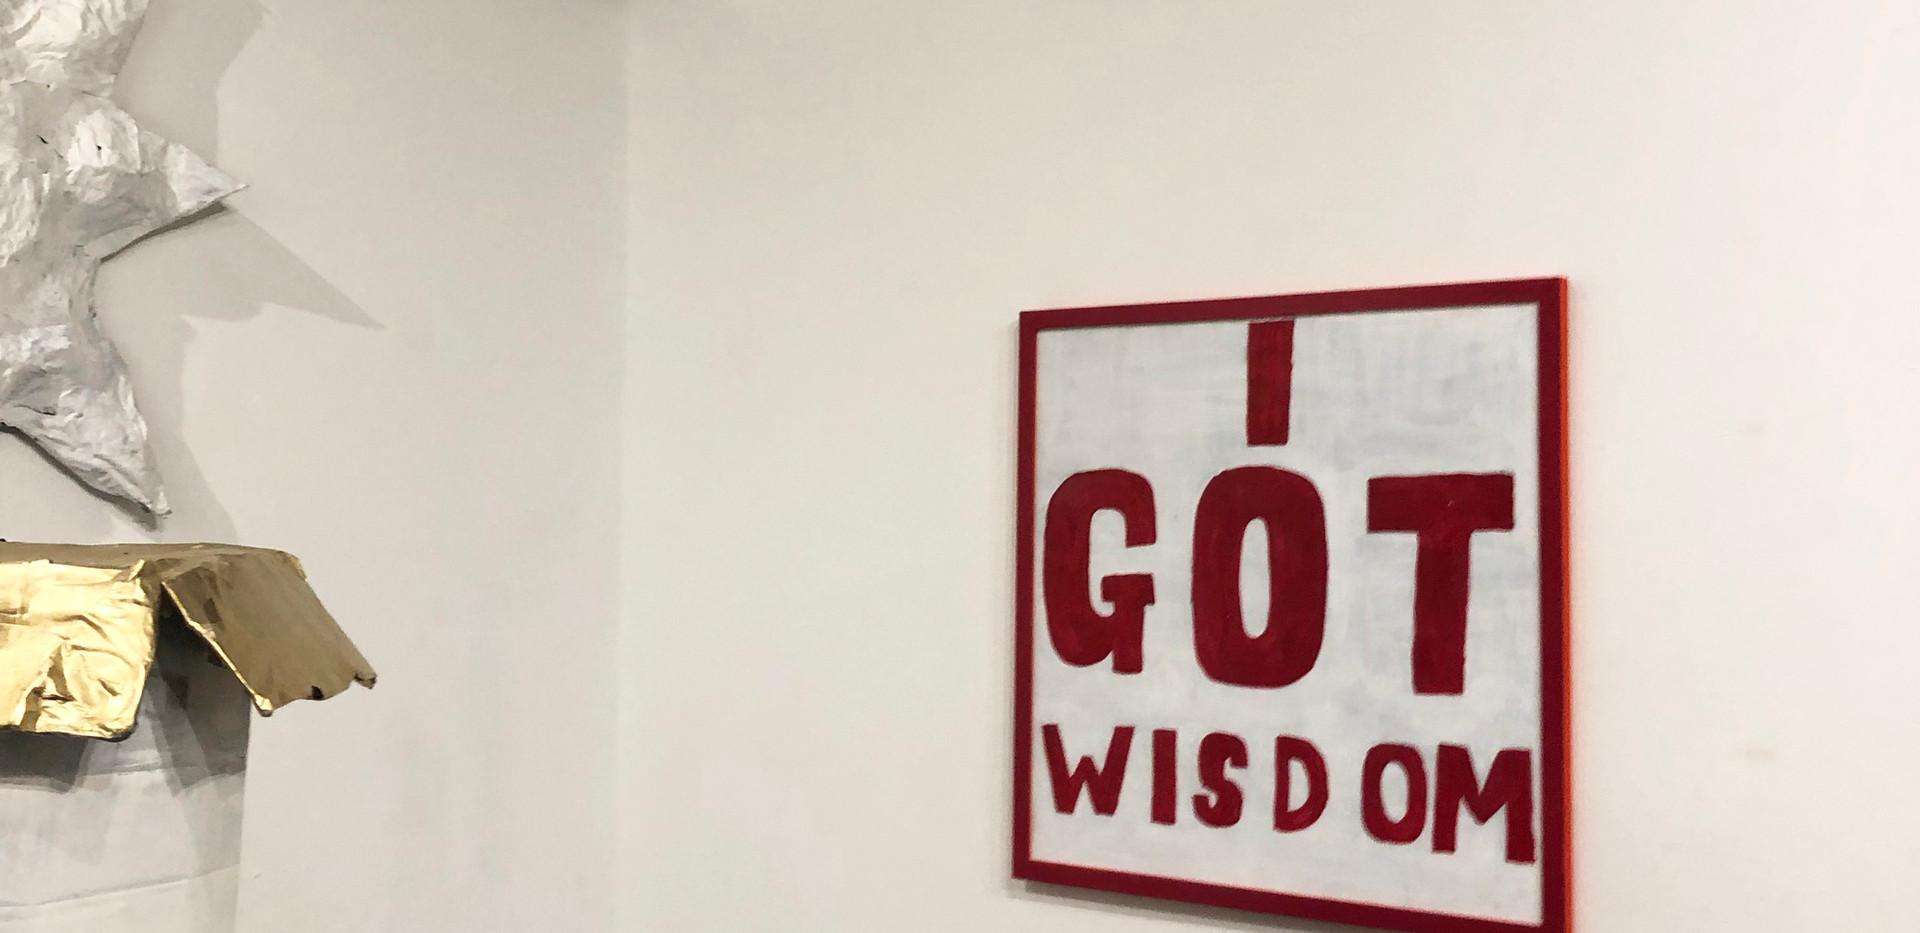 'In my prime' and 'I got wisdom'